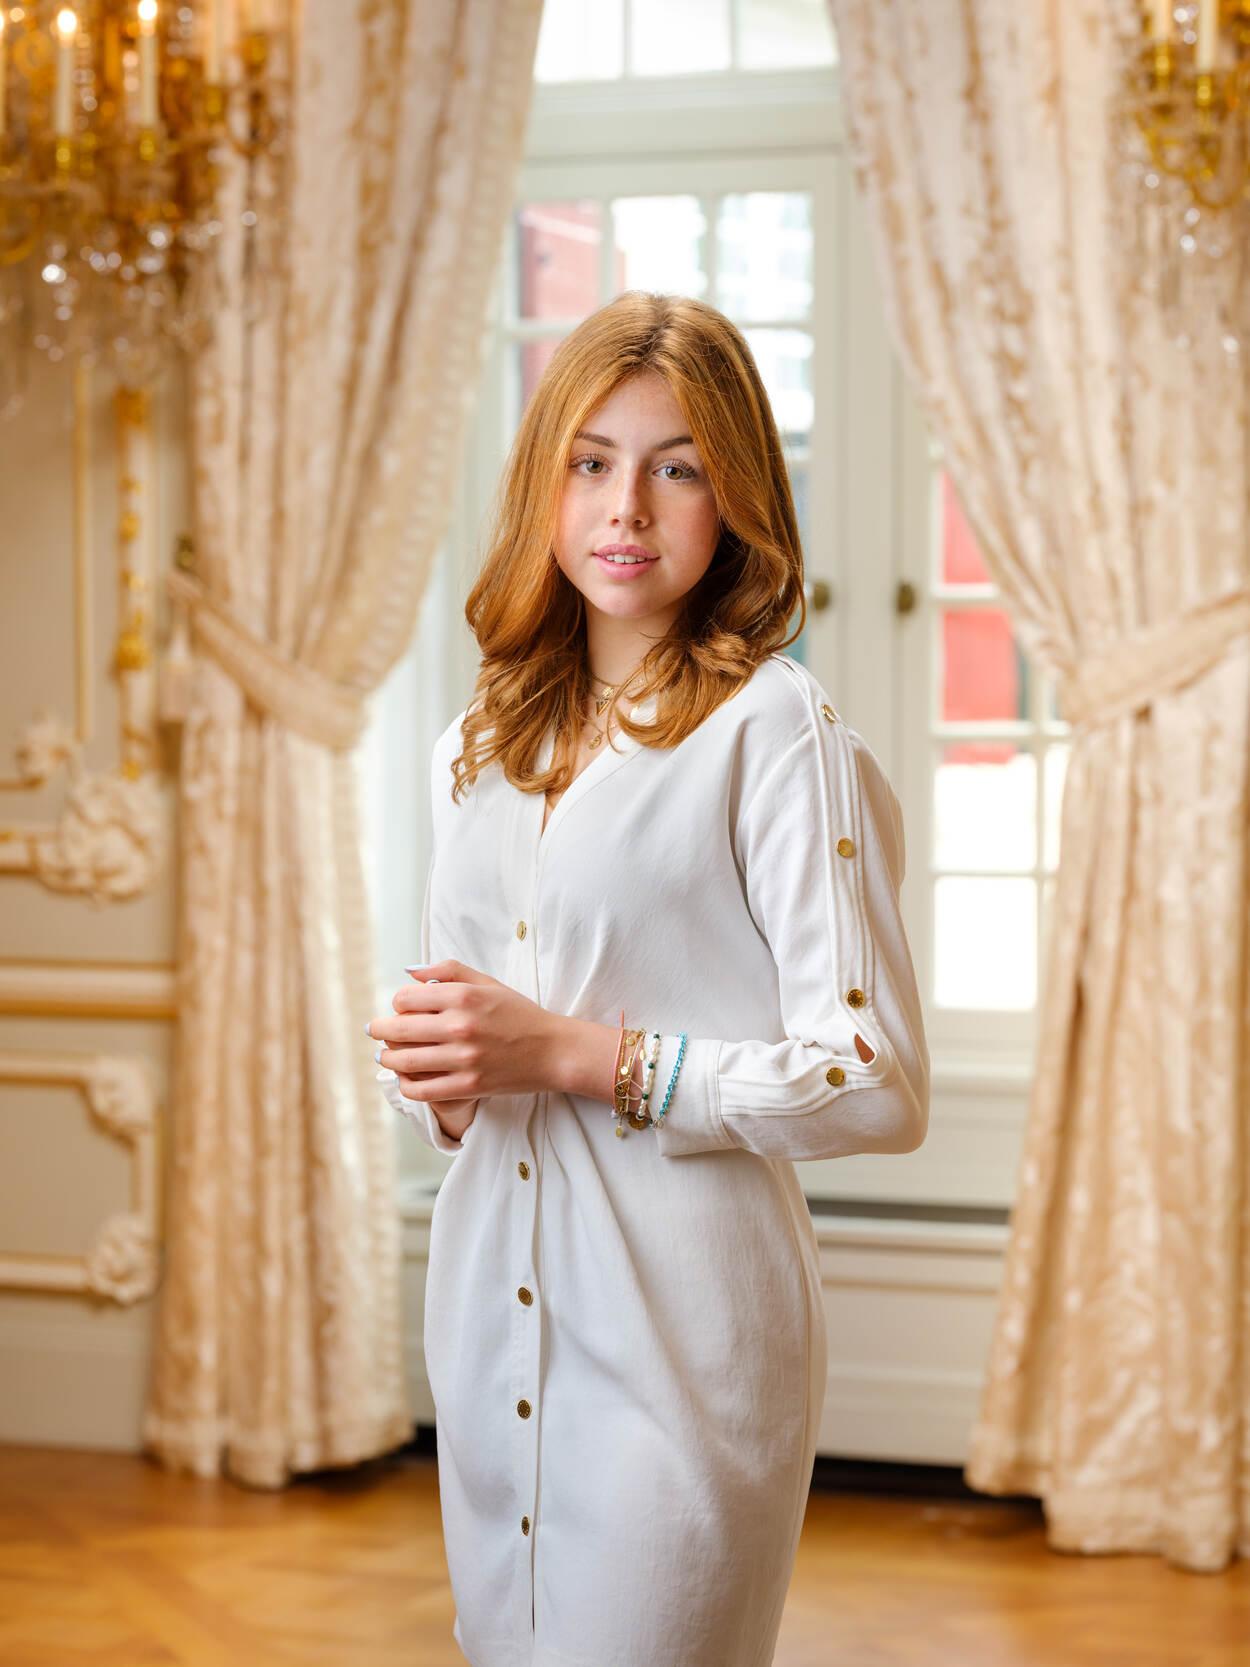 Photographs of Princess Alexia | Photos | Royal House of the Netherlands